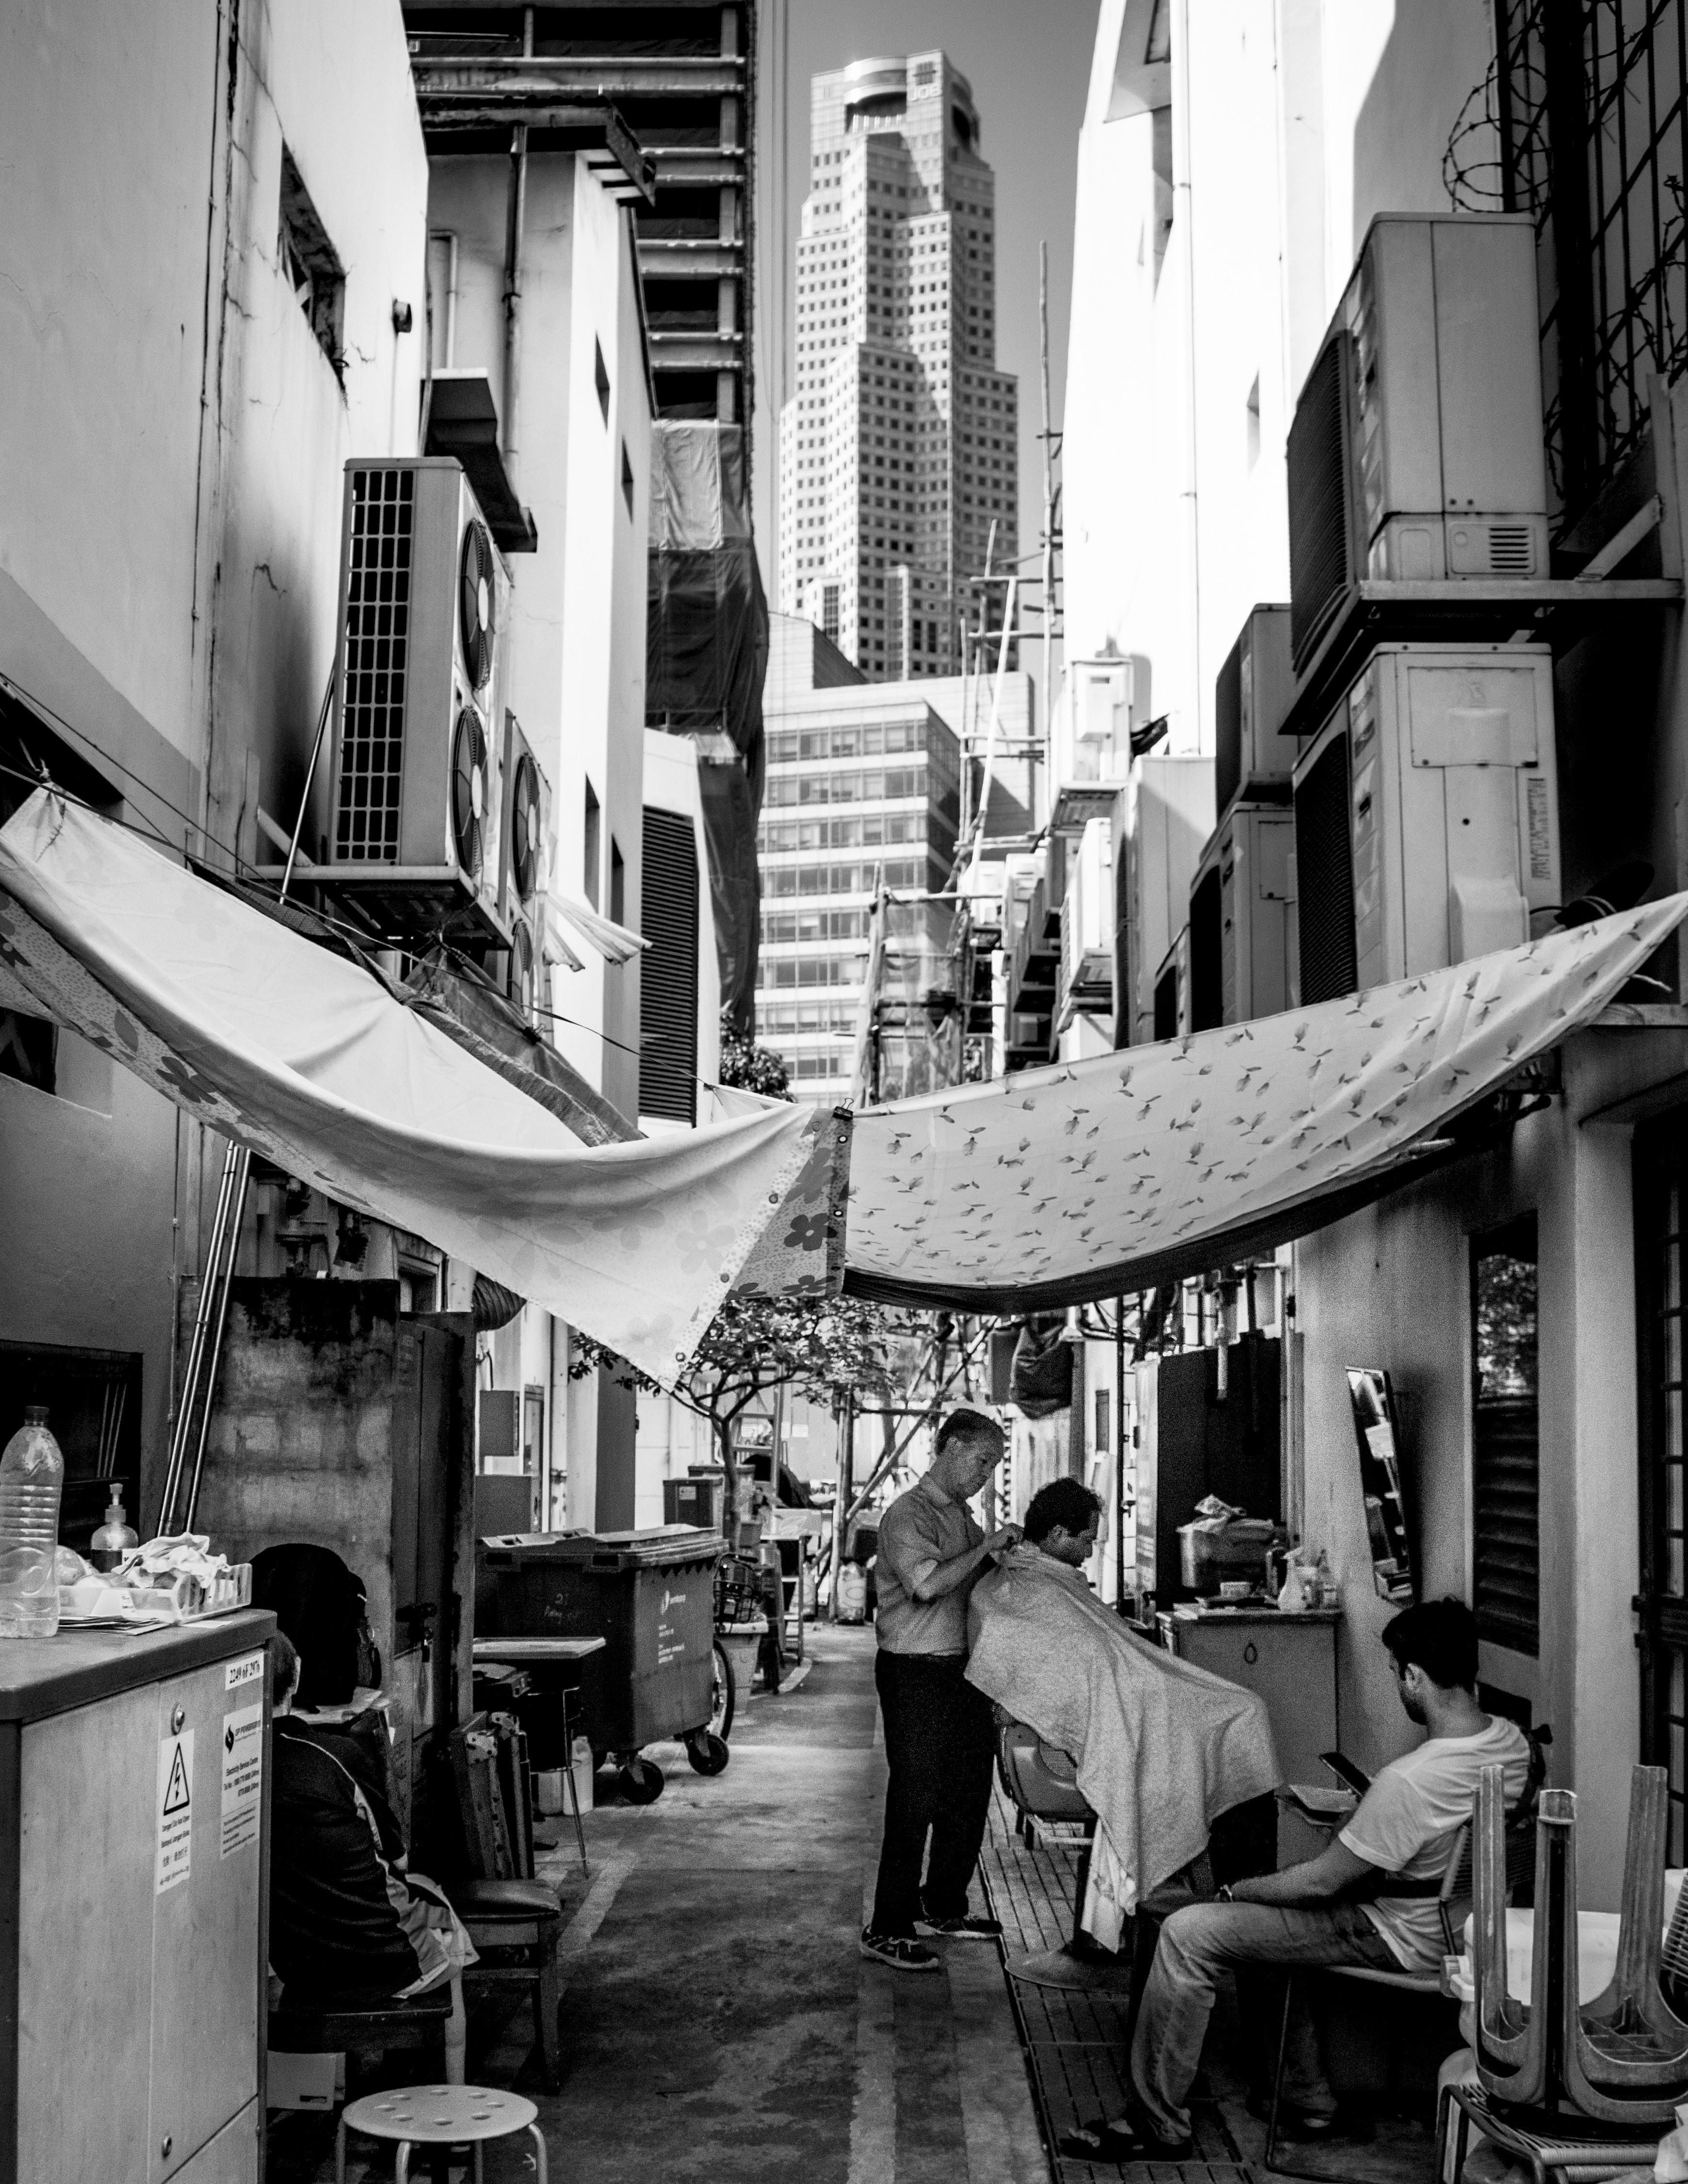 grayscale photo of barbershop outside near buildings